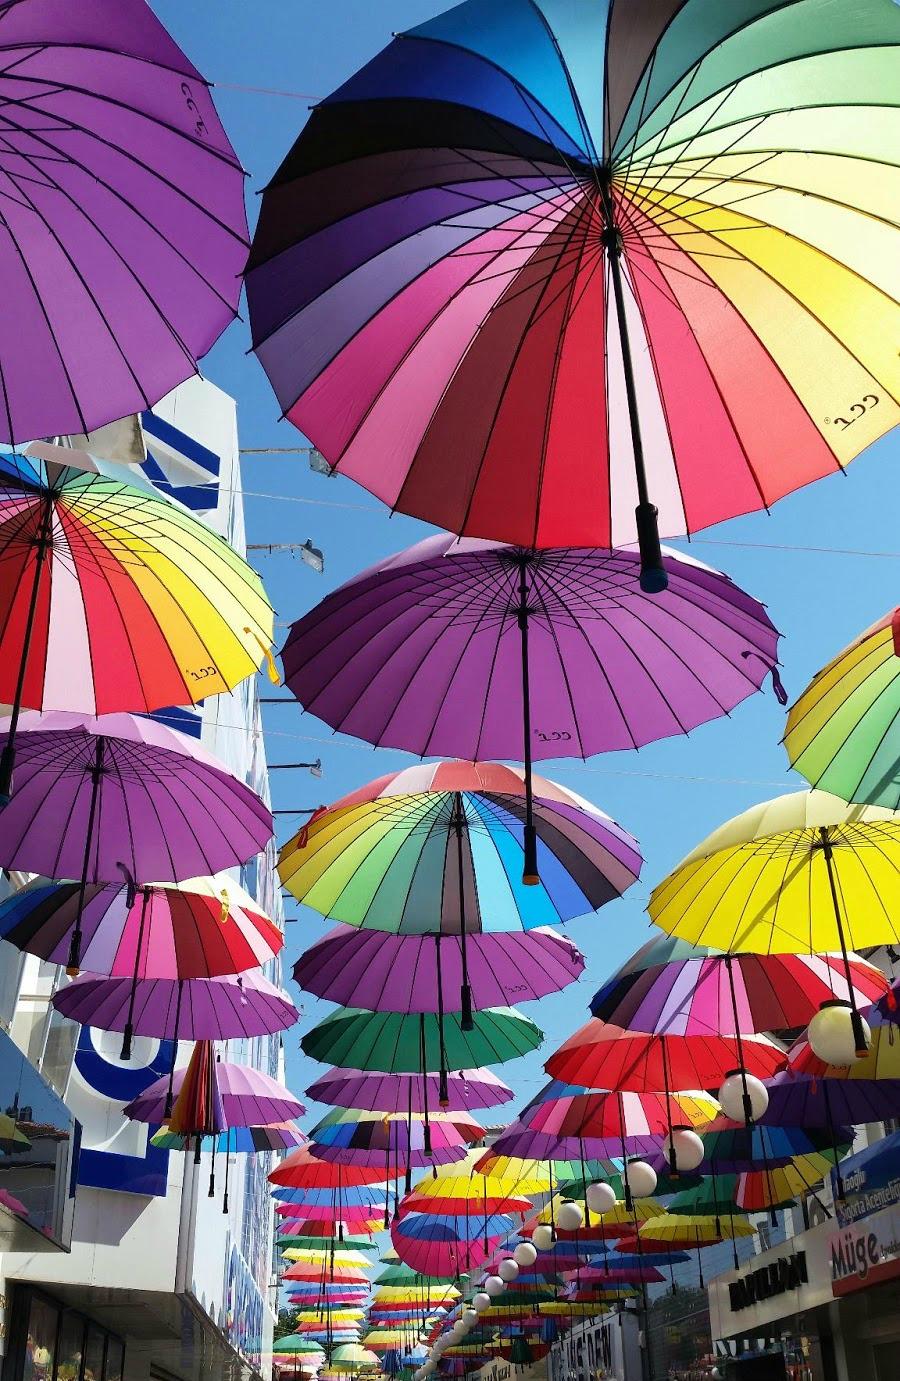 Fethiye umbrellas